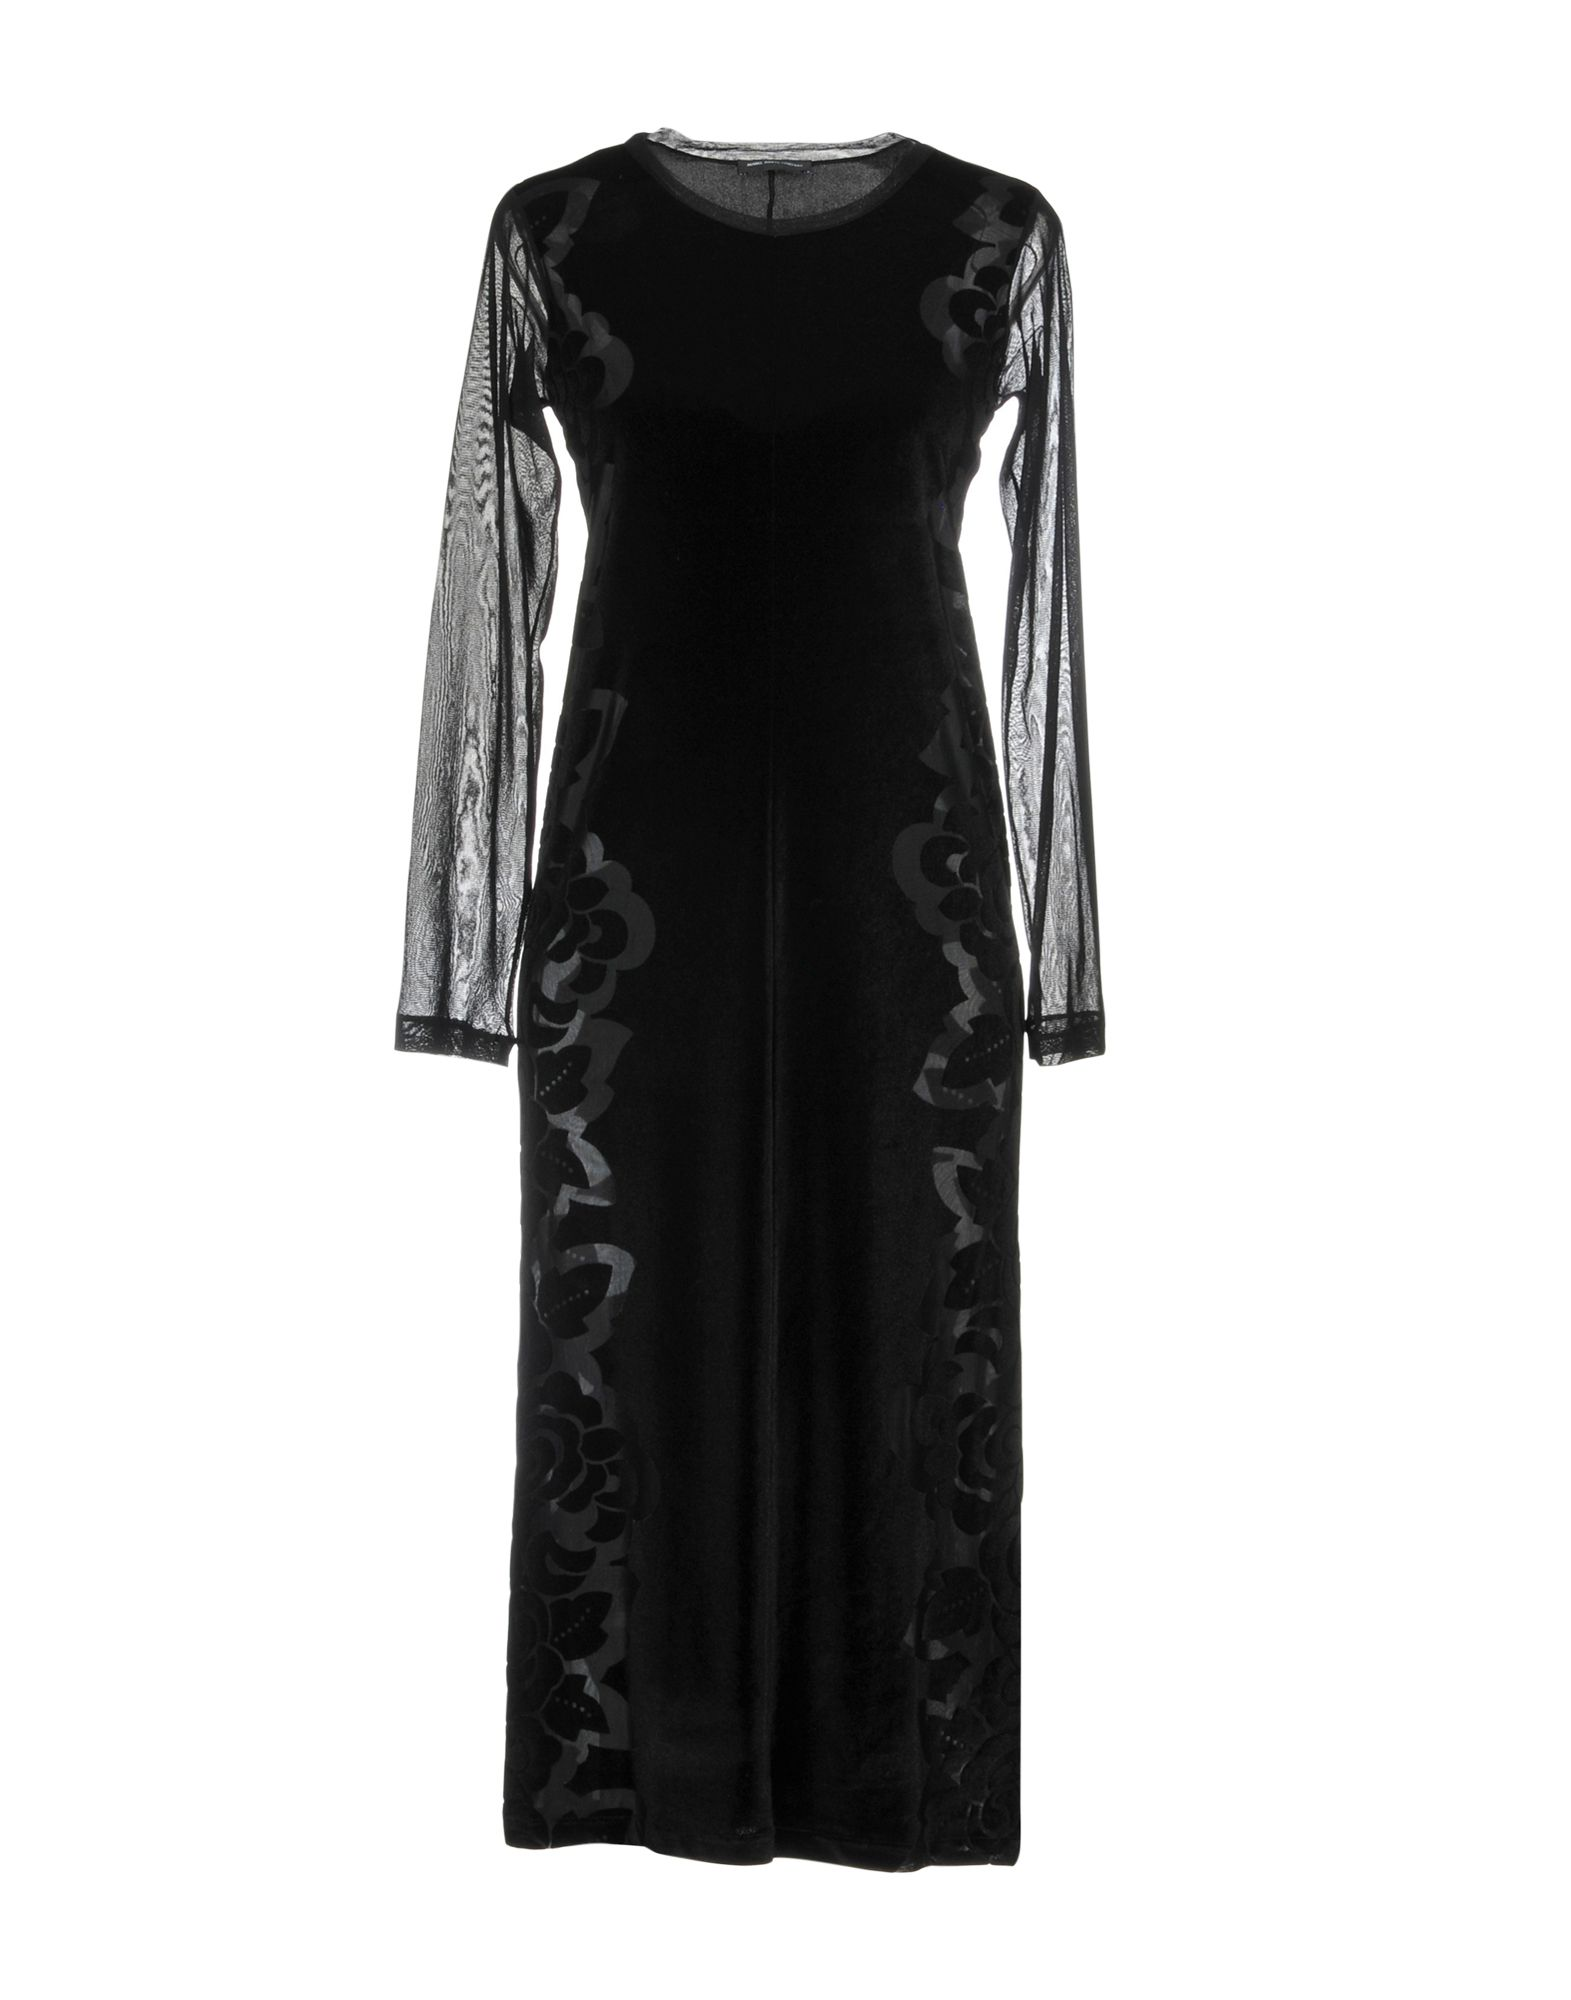 MNML COUTURE Платье длиной 3/4 padì couture юбка длиной 3 4